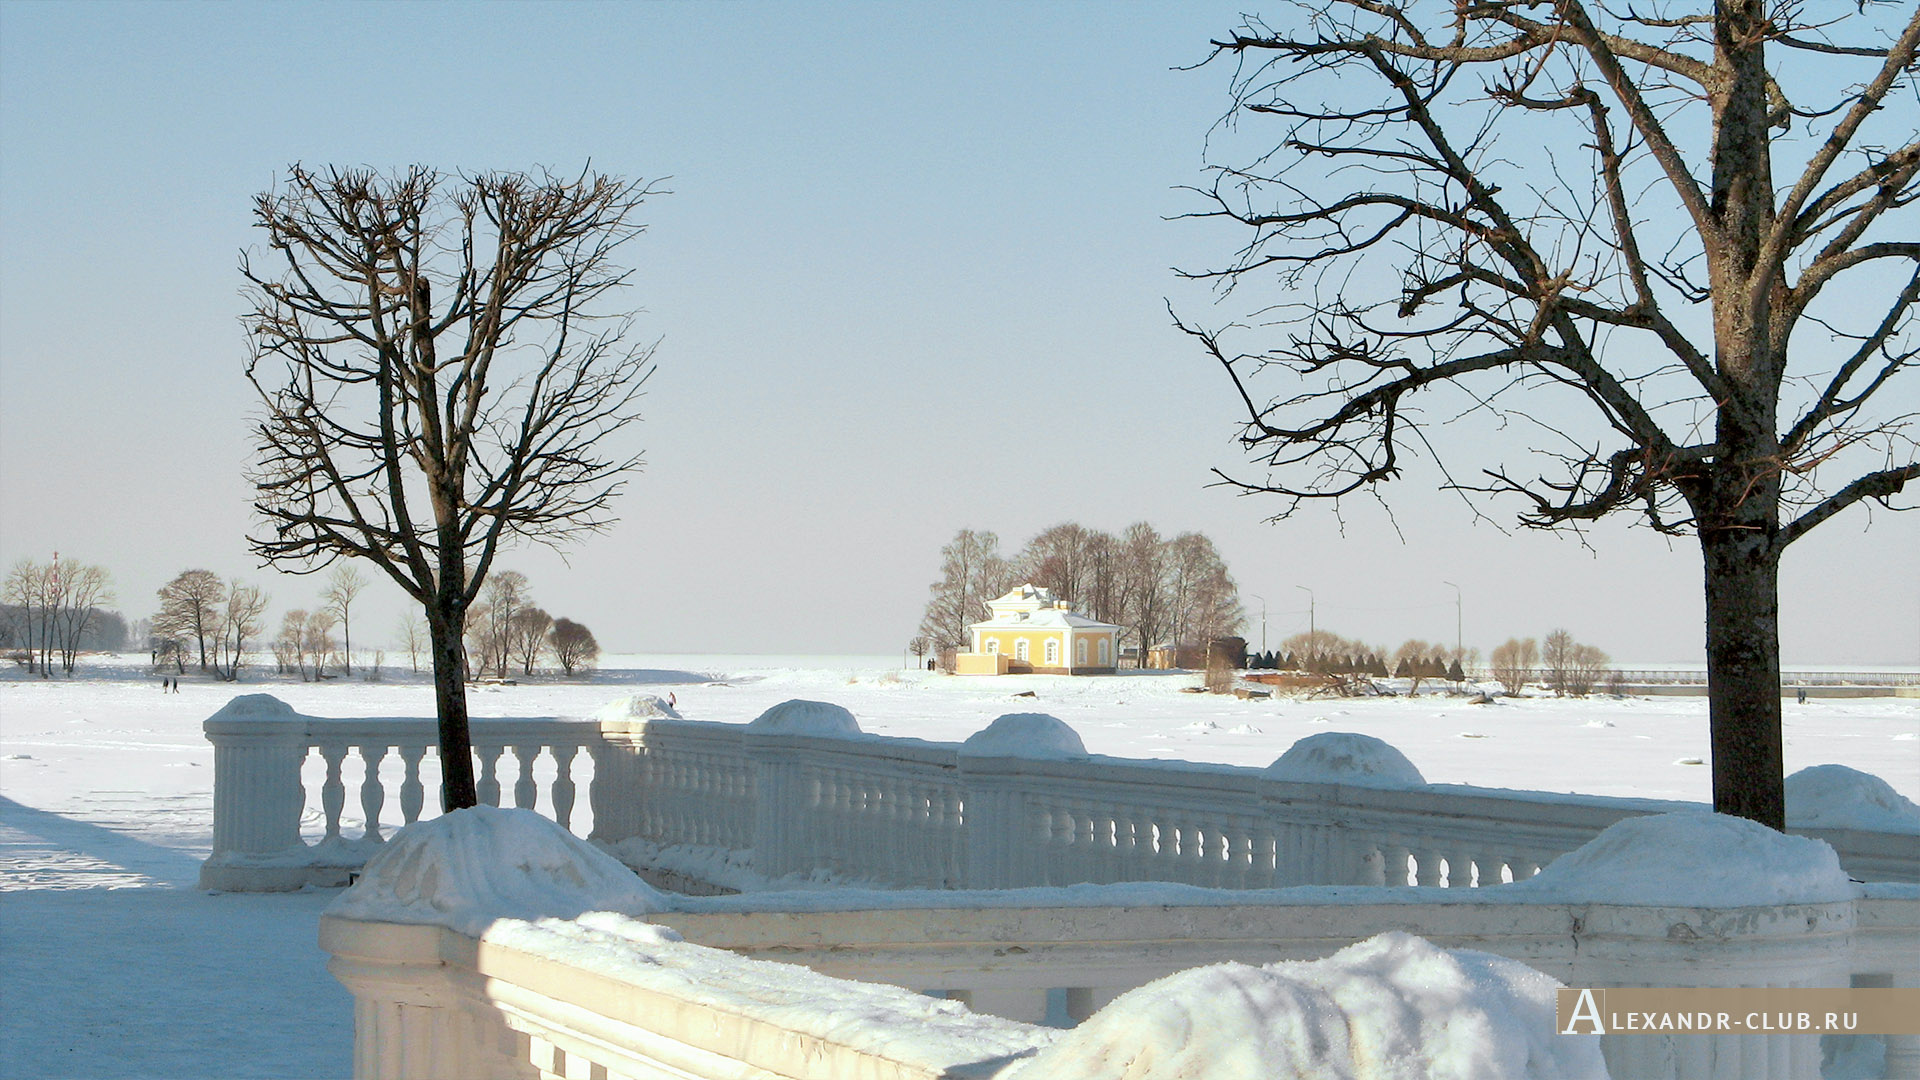 Петергоф, зима, Нижний парк, дворец «Монплезир» – 5